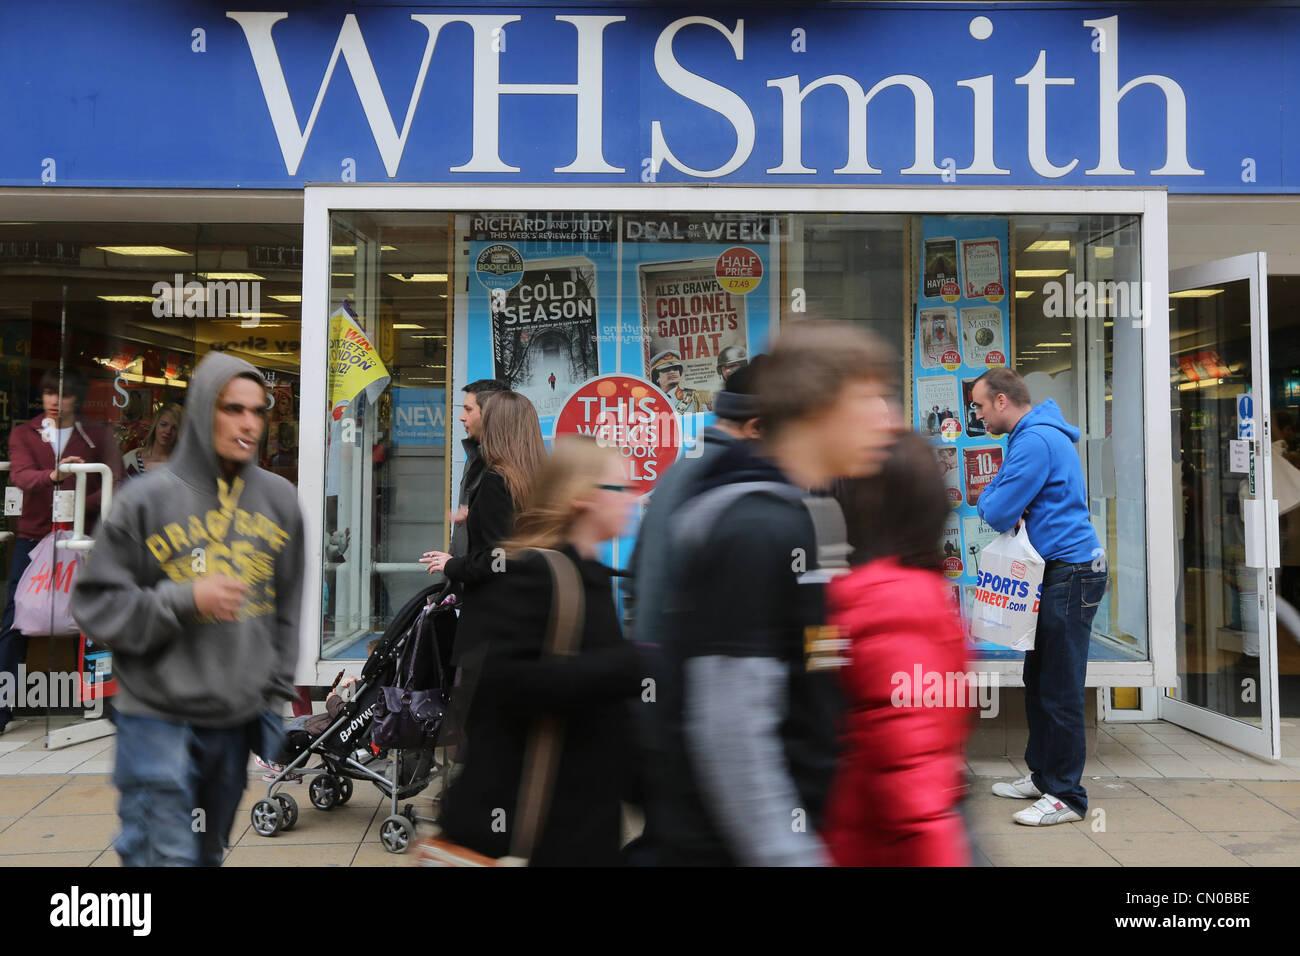 W H Smith Stock Photo